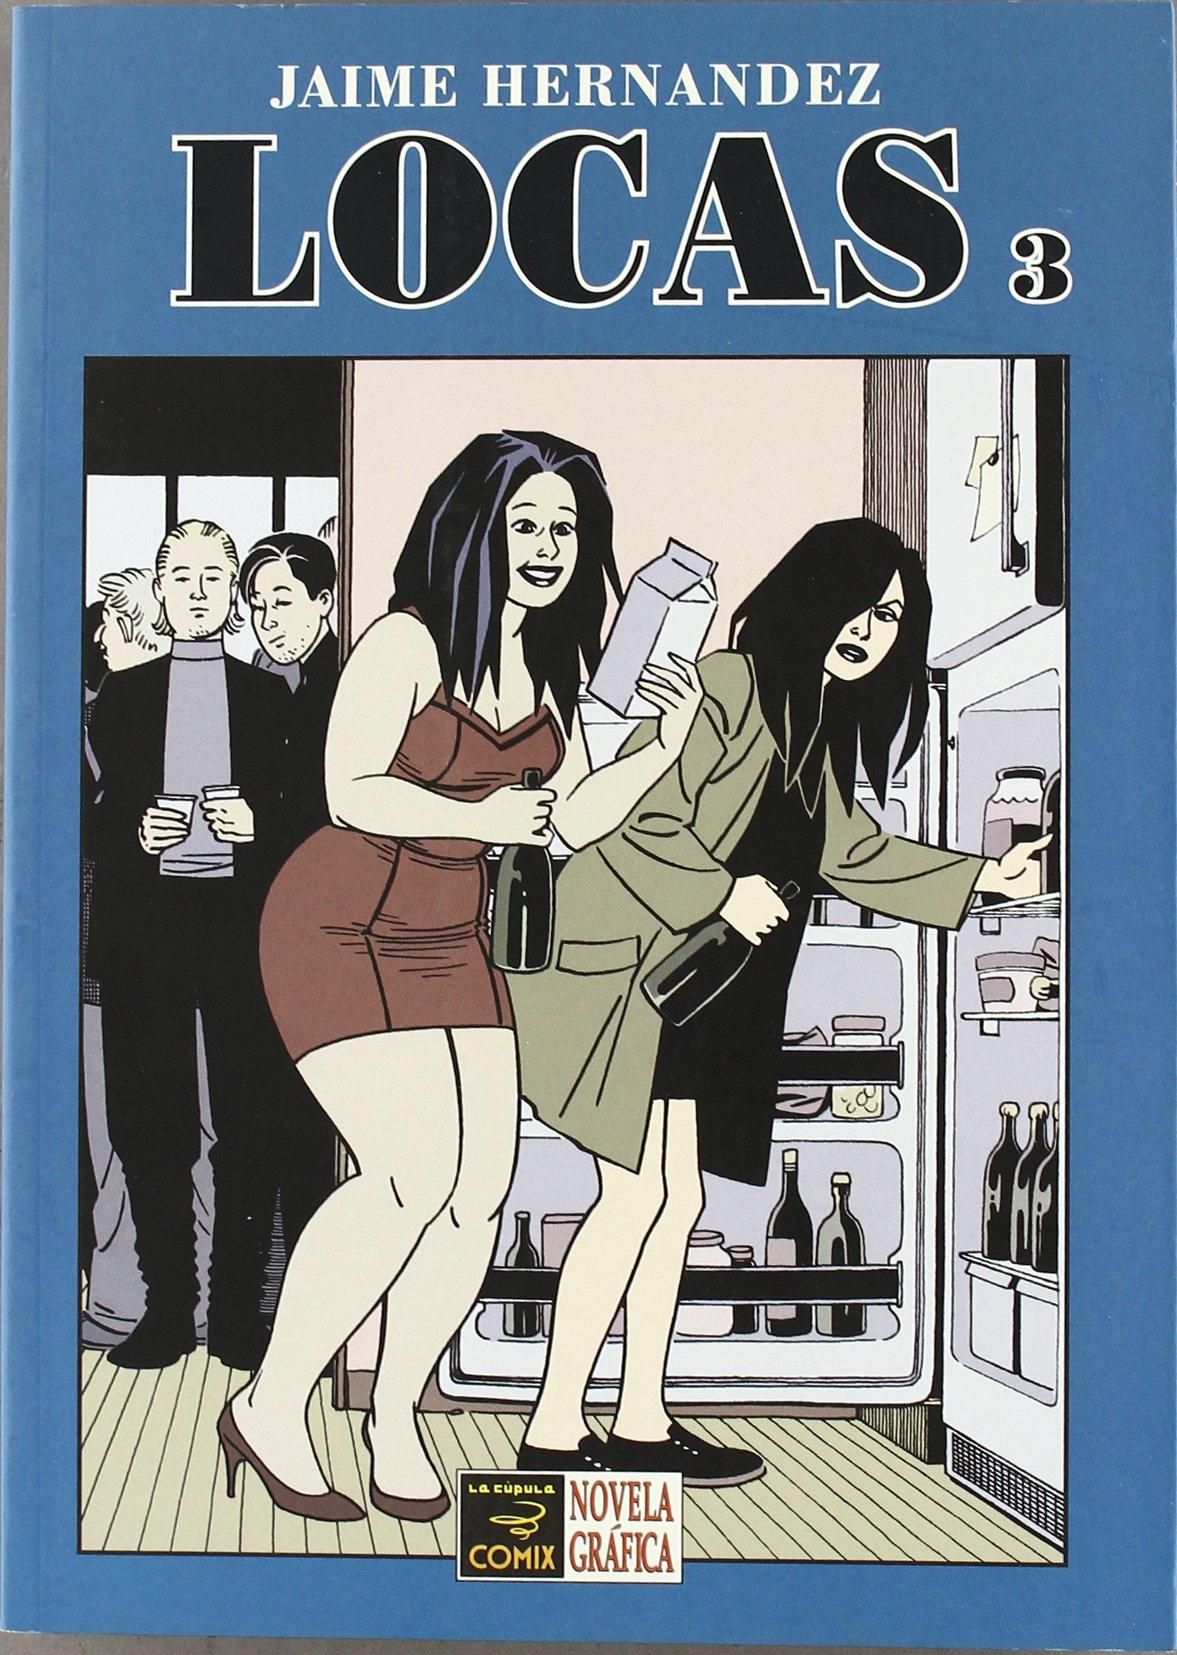 Locas 3 / Madwoman 3 (Spanish Edition)